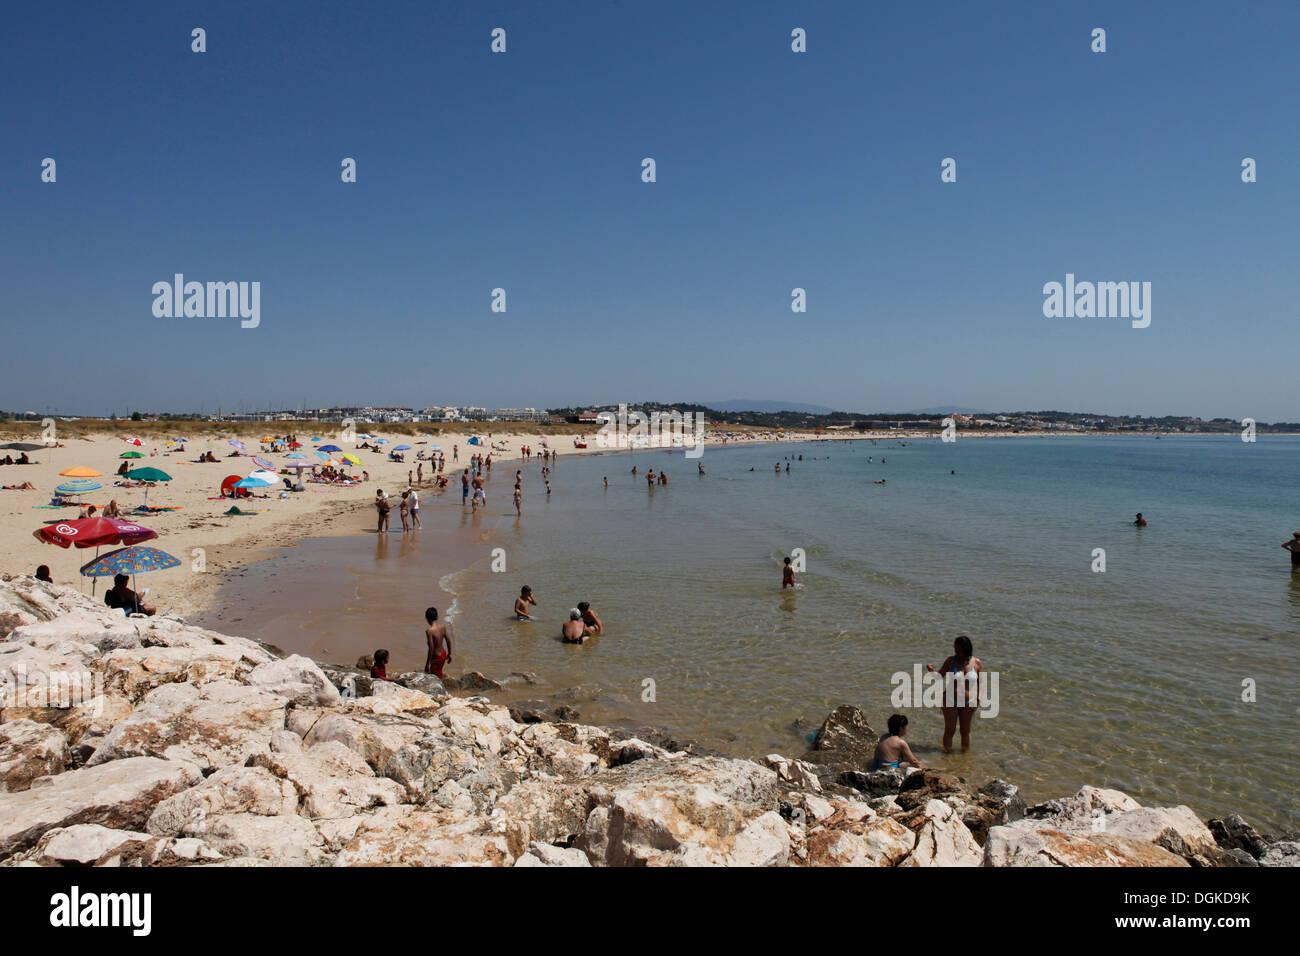 beach at lagos, algarve, portugal - Stock Image